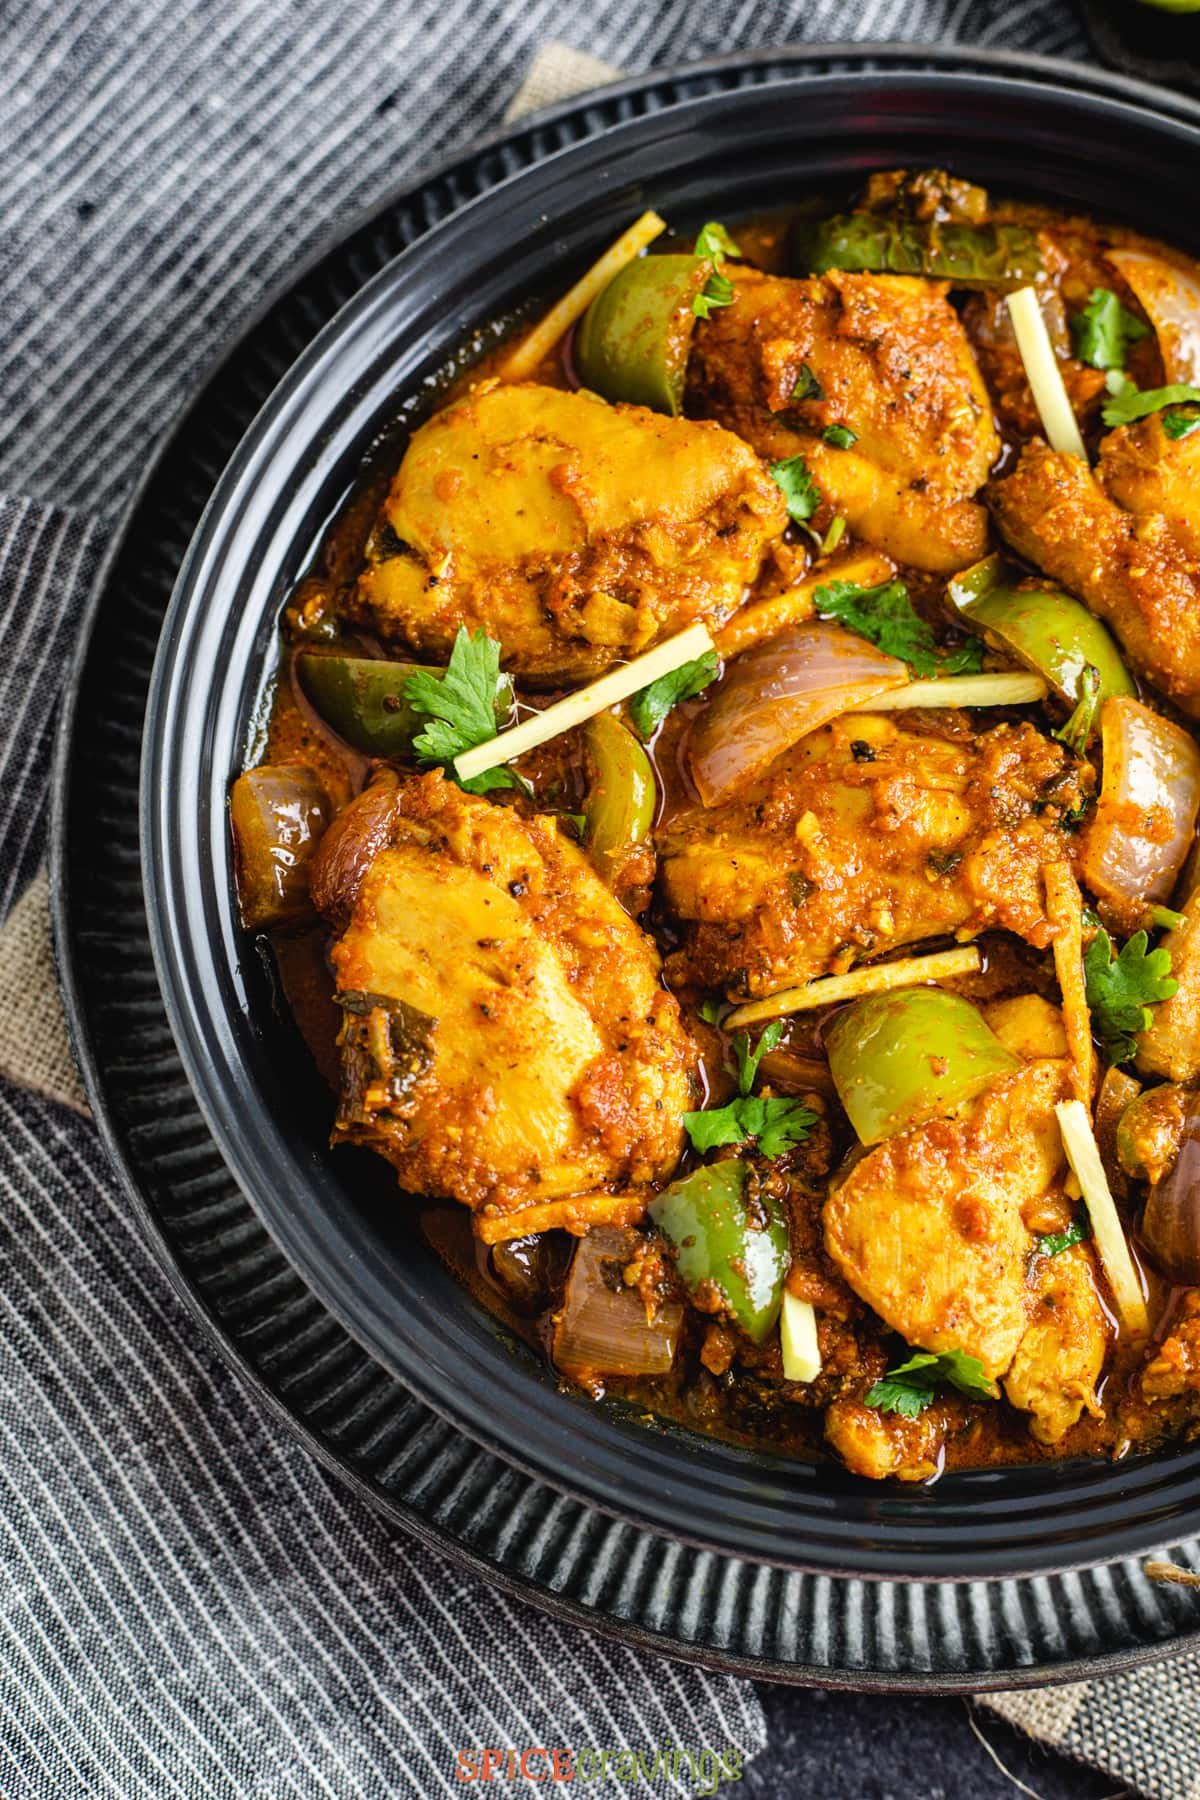 Kadai Chicken in a black bowl